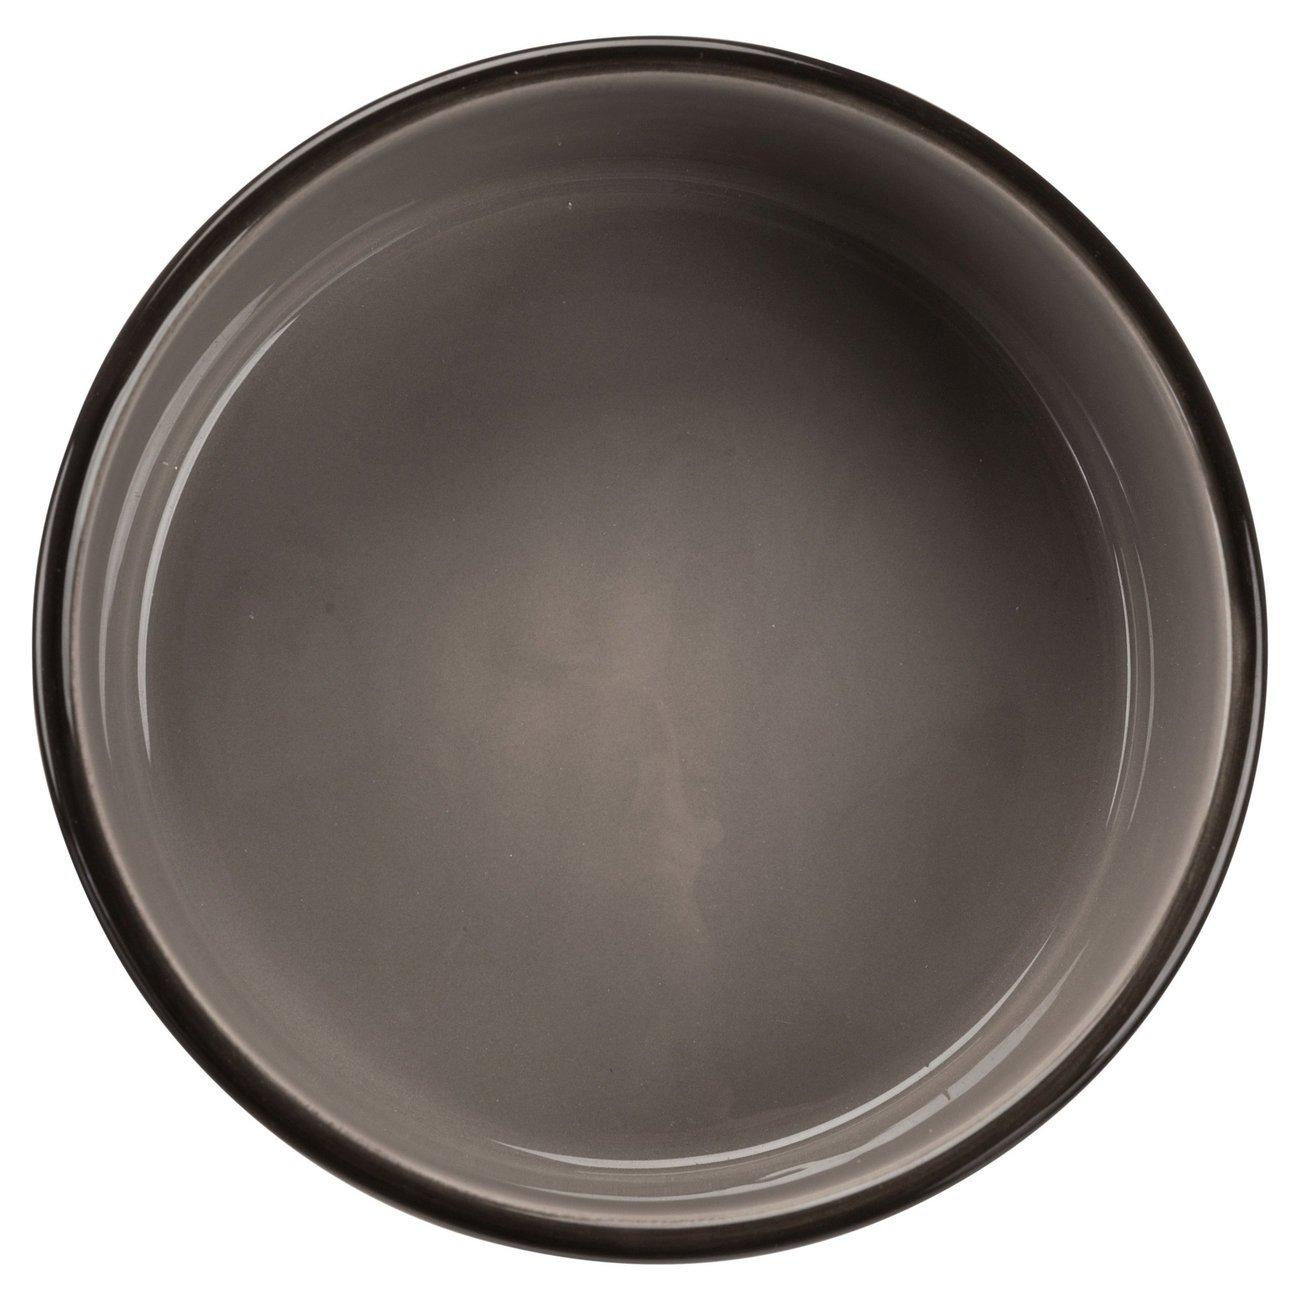 Keramiknapf mit Pfoten Bild 2